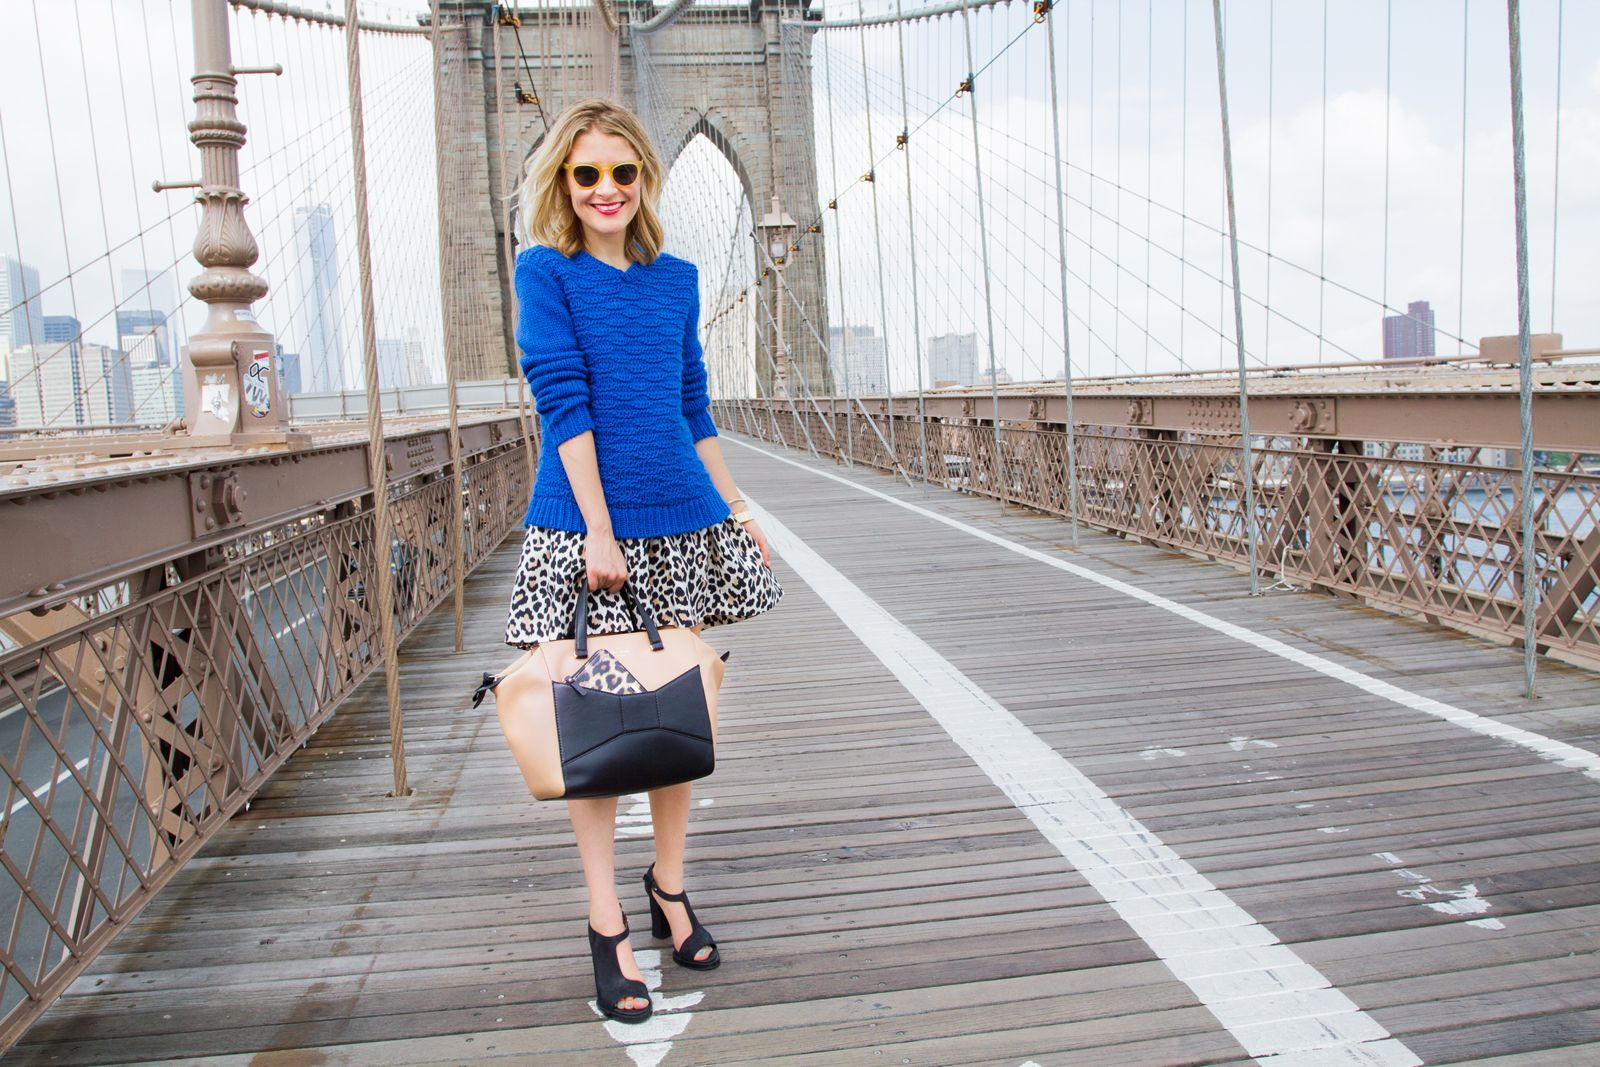 3 Girls, 9 Looks, 15 Reasons To Love NYC! #refinery29